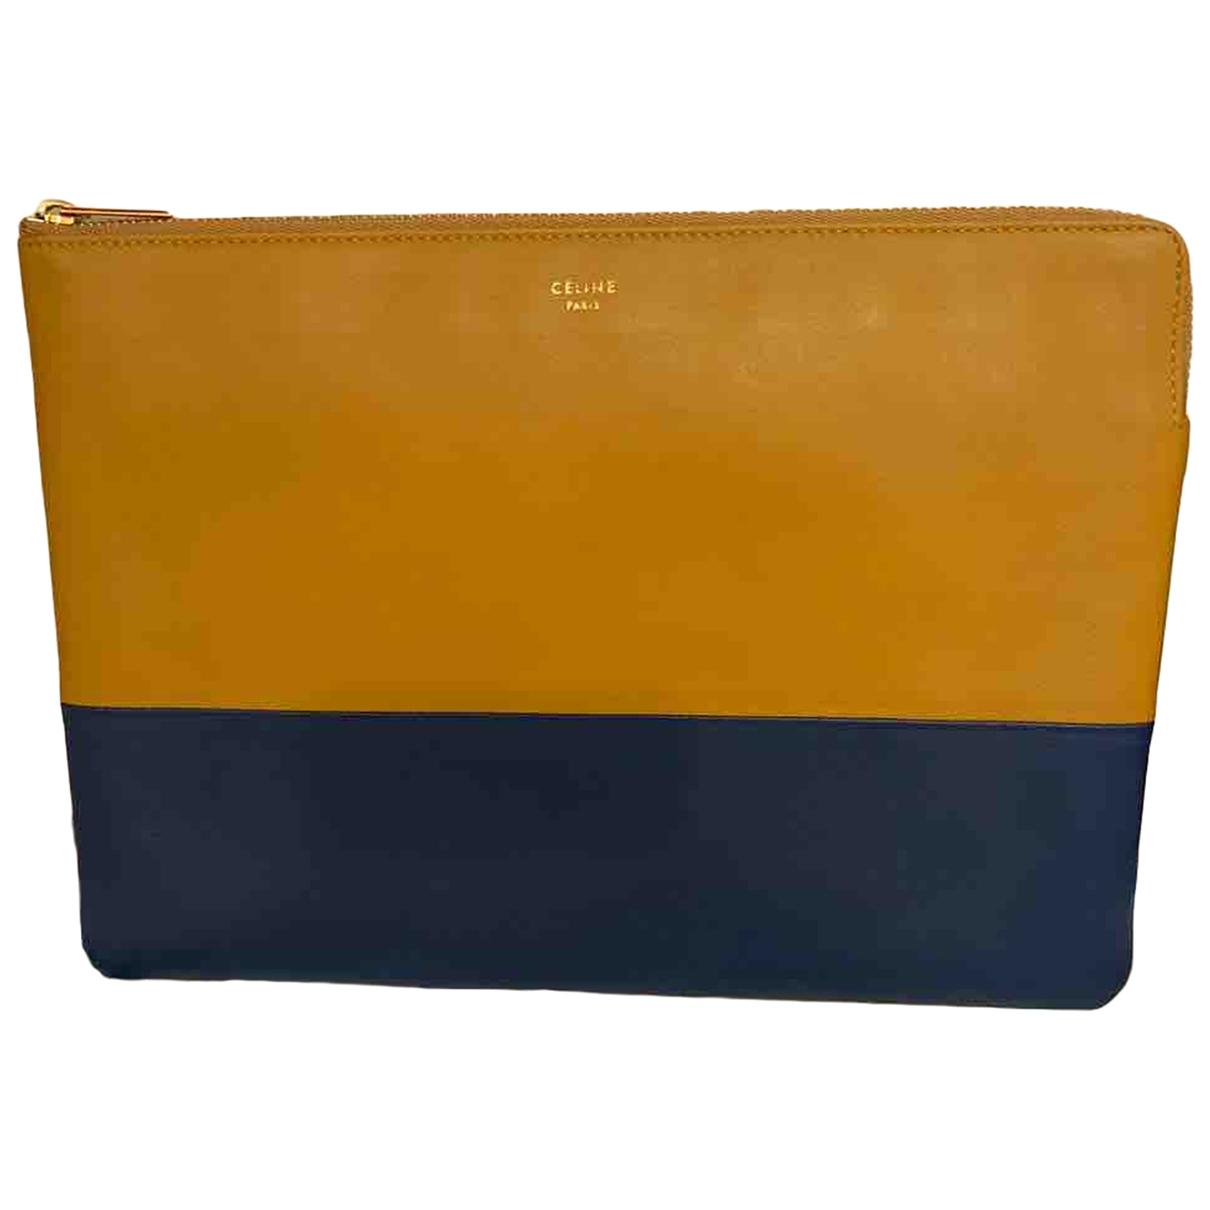 Celine \N Blue Leather Clutch bag for Women \N